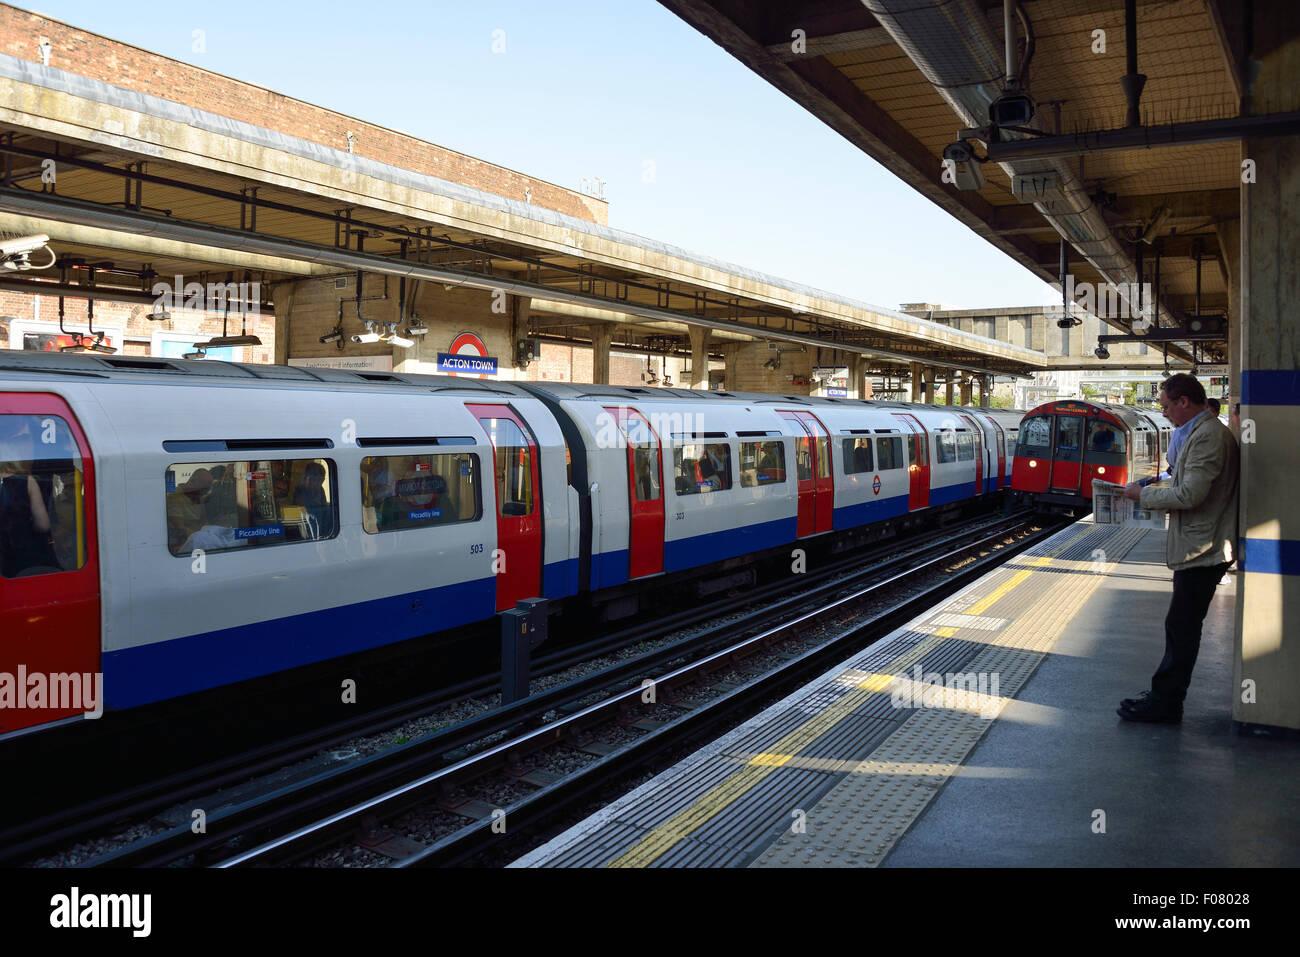 Platform at Acton Town Underground Station, Acton, London Borough of Ealing, London, England, United Kingdom - Stock Image